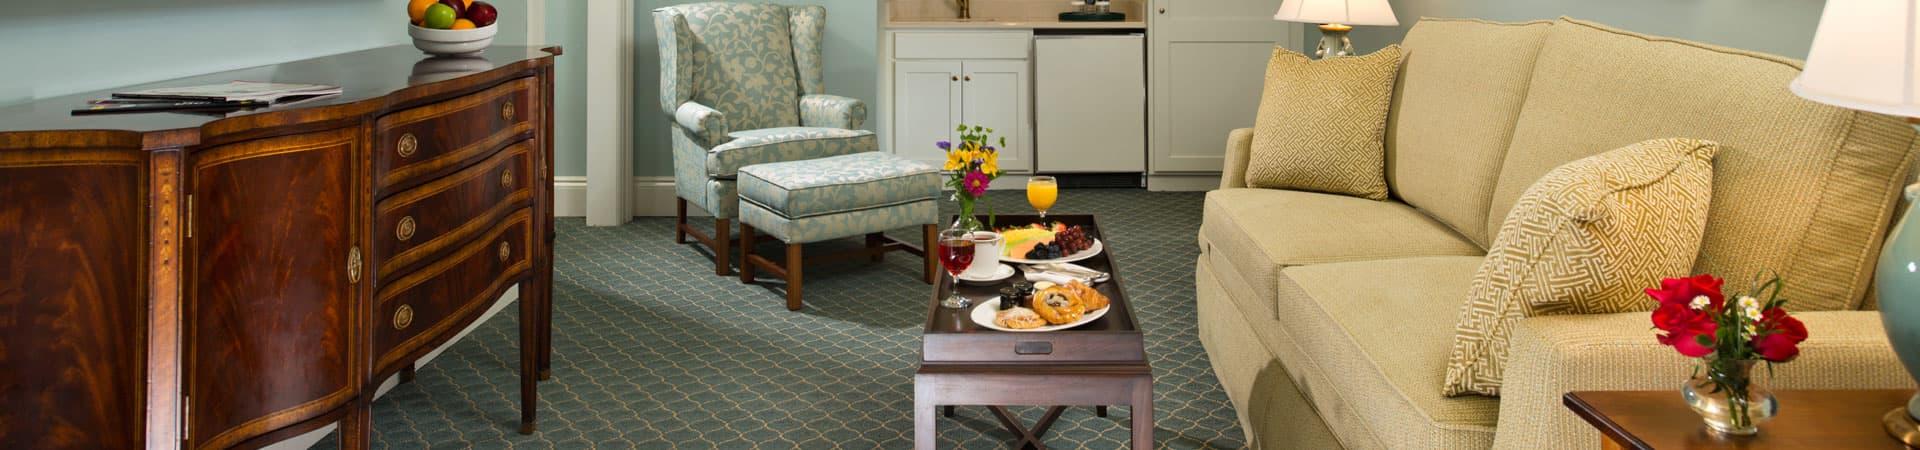 Accomadation at The Otesaga Resort Hotel Cooperstown, New York